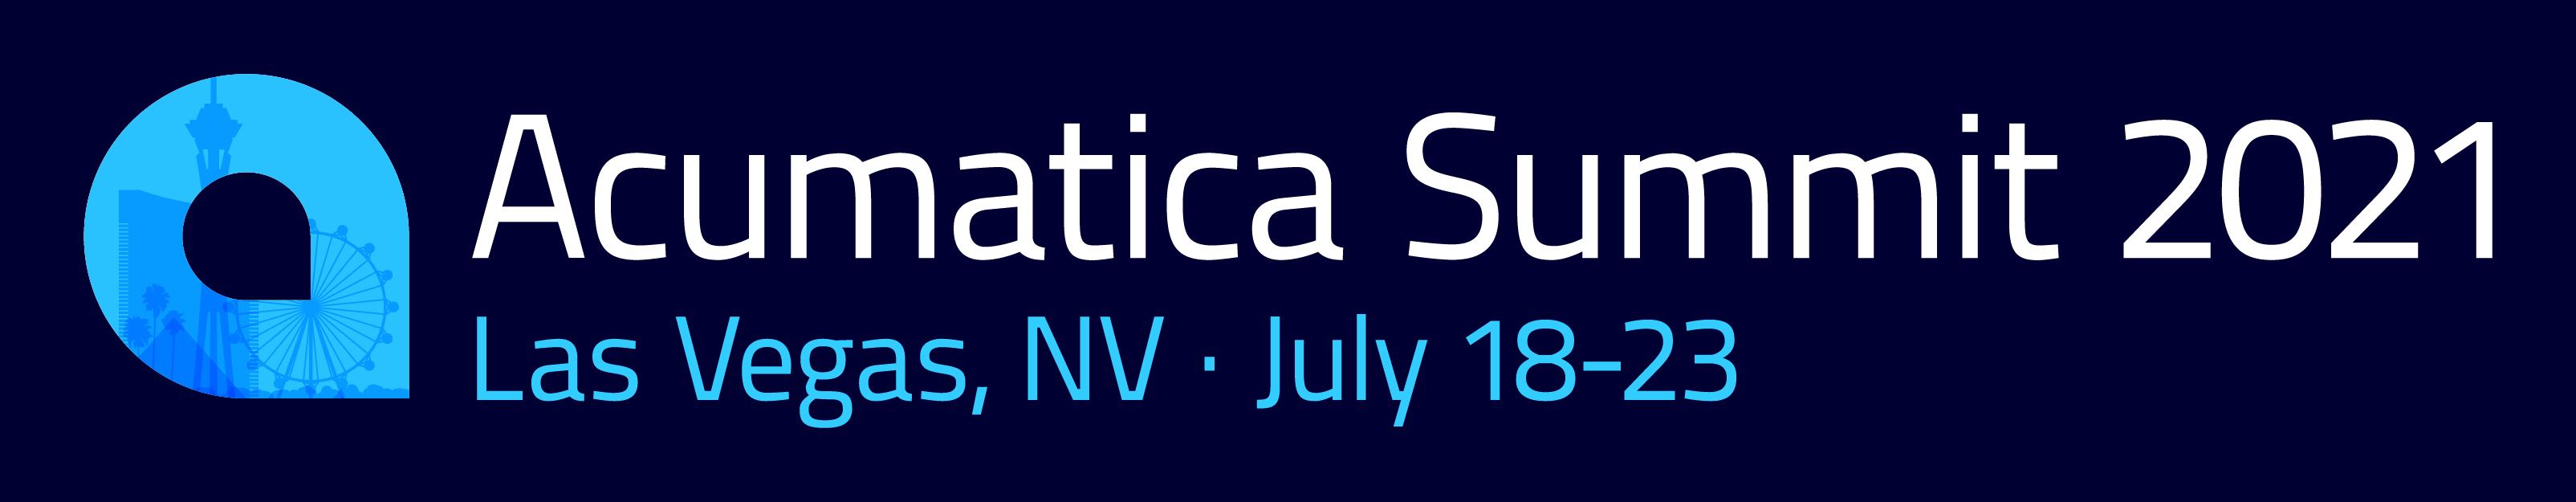 Acumatica Summit